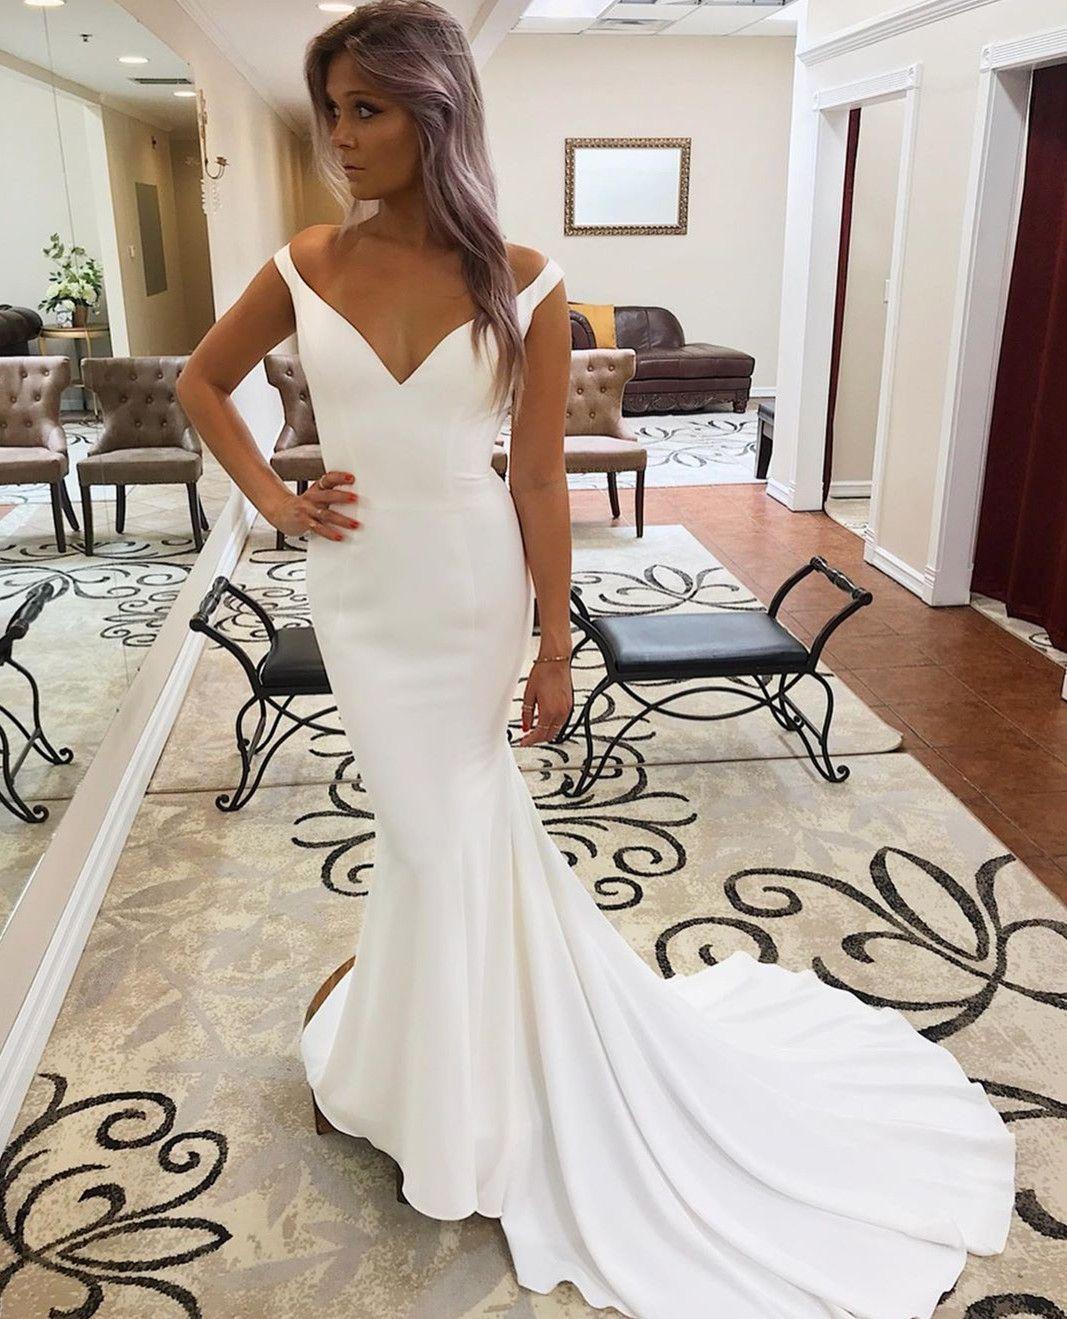 Vintage Long Sleeveless Satin V-Necck Wedding Dresses Lace Up Back Sweep Train Custom Made Ivory Bridal Gowns Brautkleid for Women